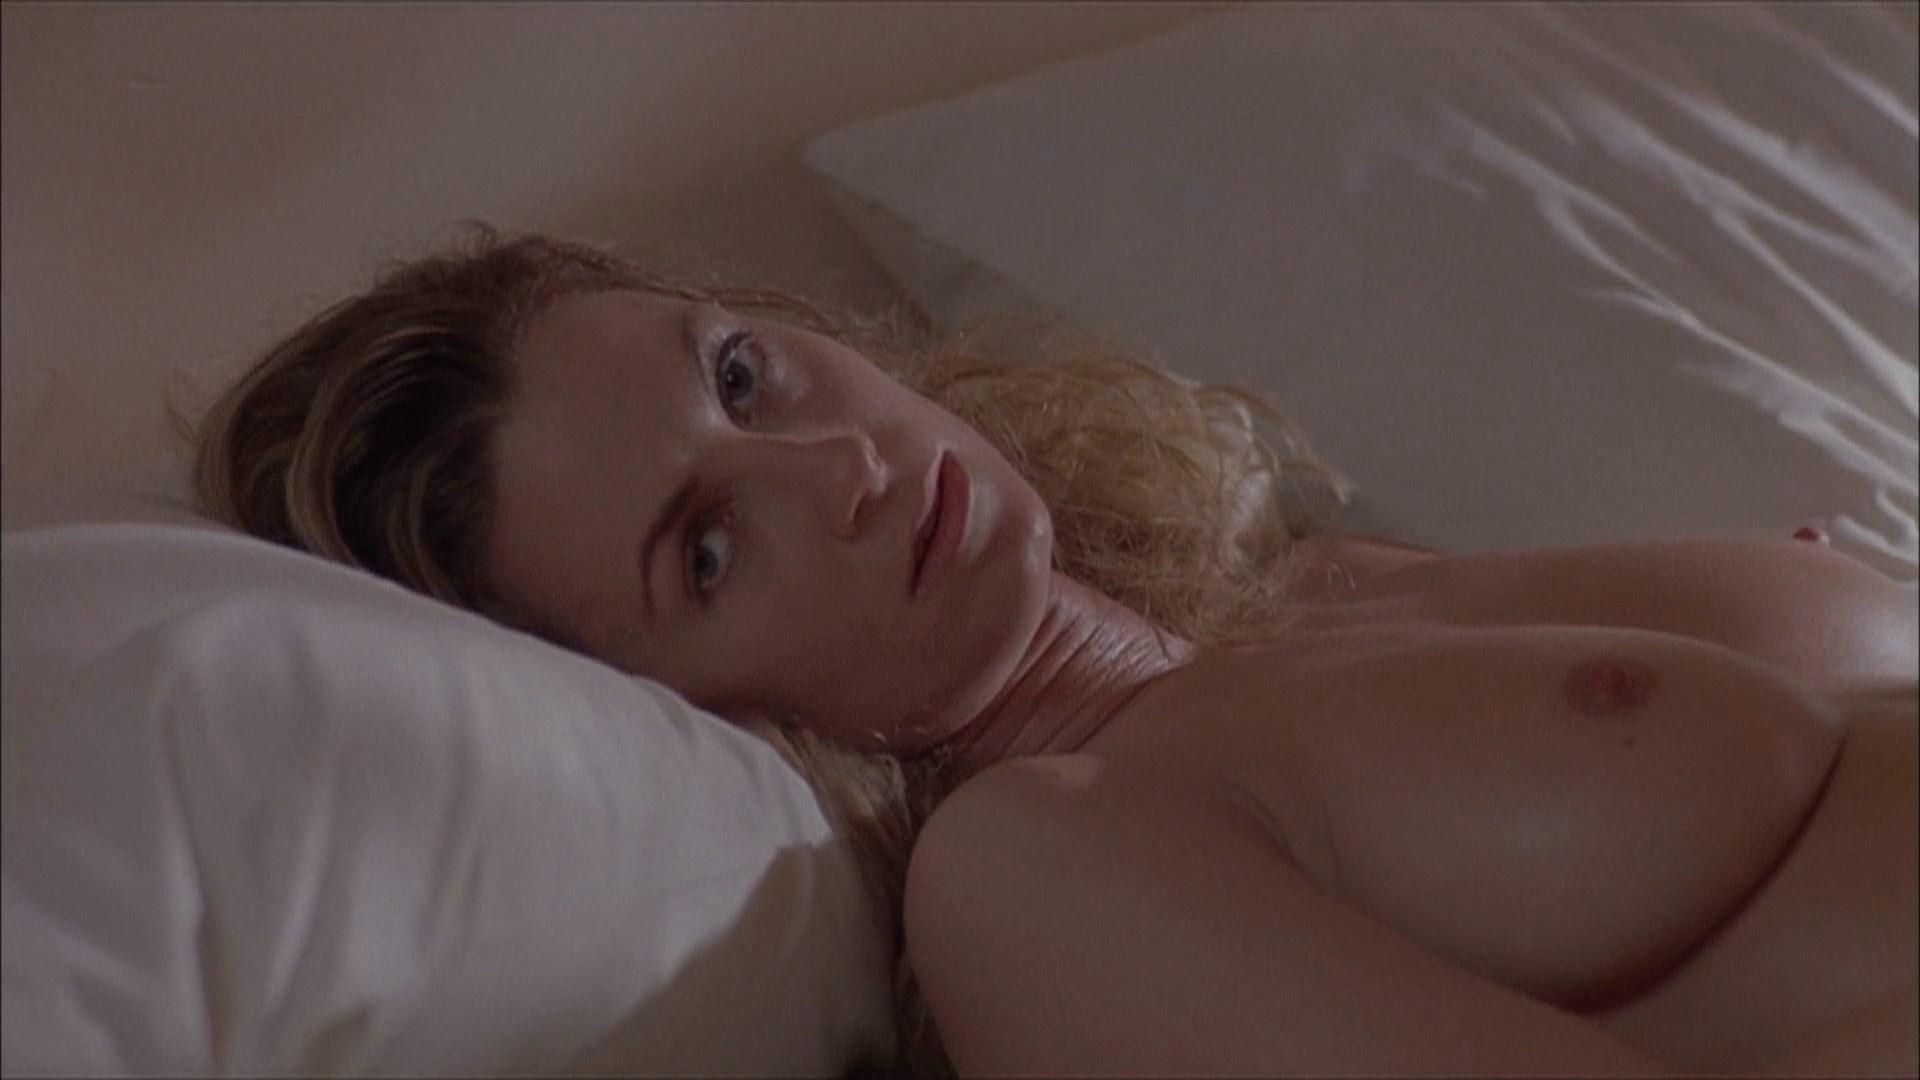 diane-lane-nude-pictures-adel-sheridan-big-tits